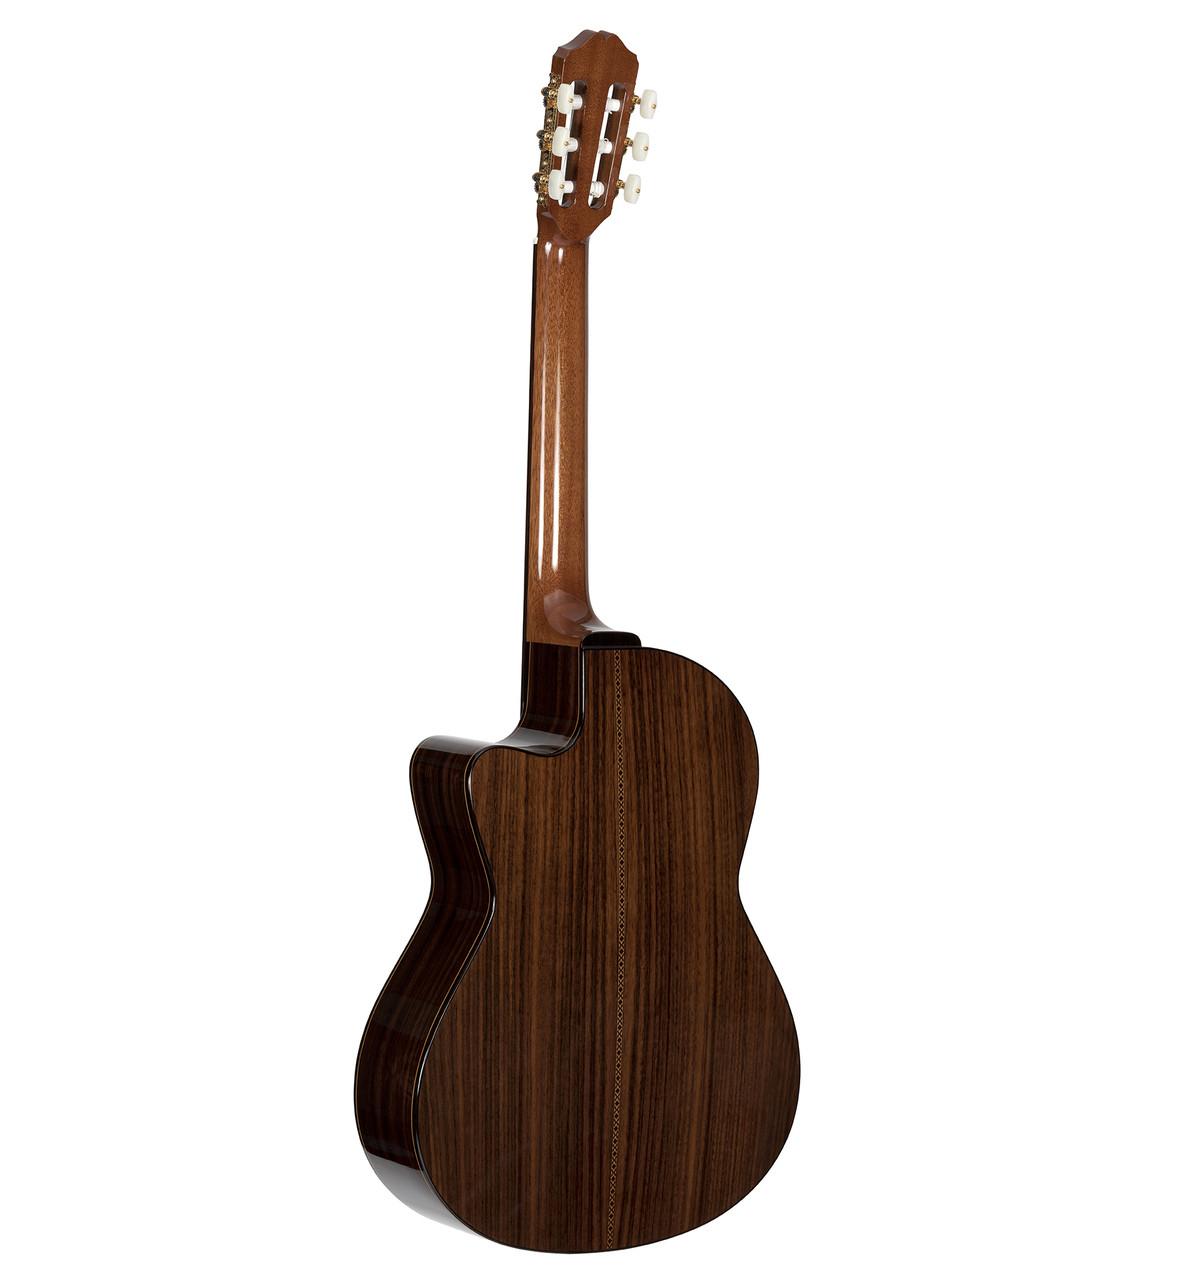 Alvarez Yairi CY75CE Standard Concert Classical Cedar/Rosewood